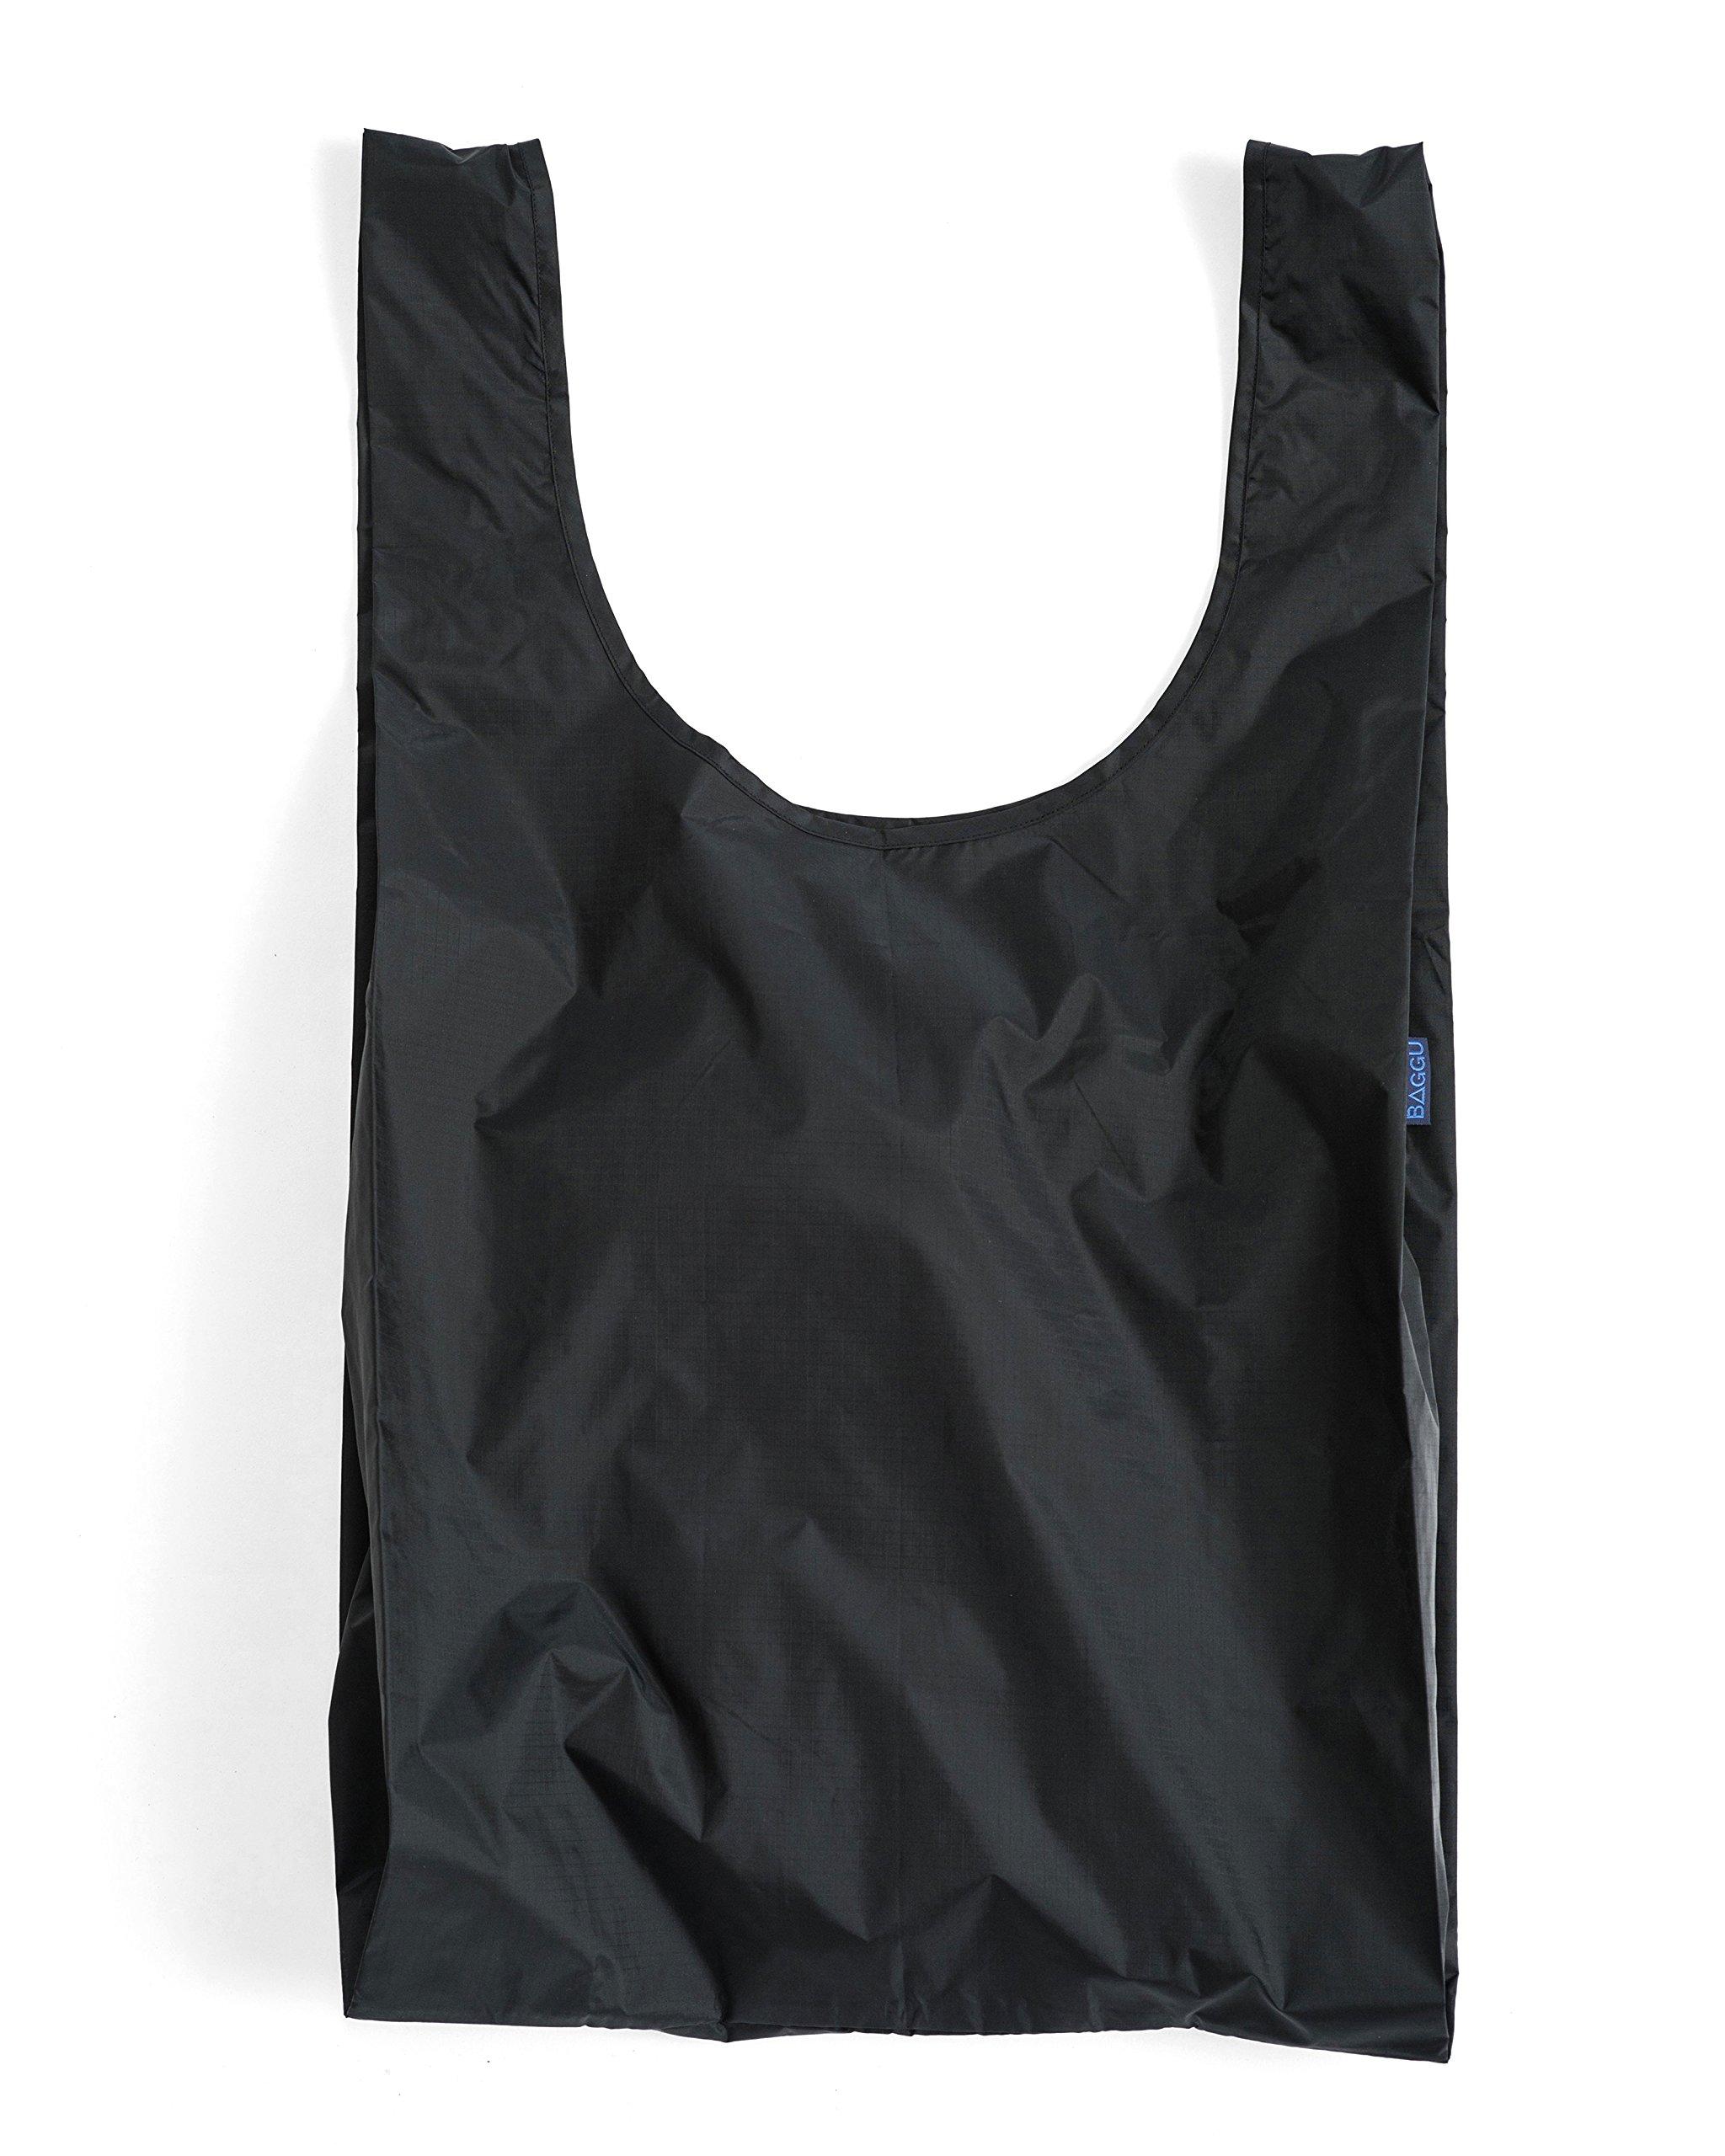 BAGGU Large Reusable Shopping Bag, Foldable Ripstop Nylon Tote for Laundry or Shopping, Black